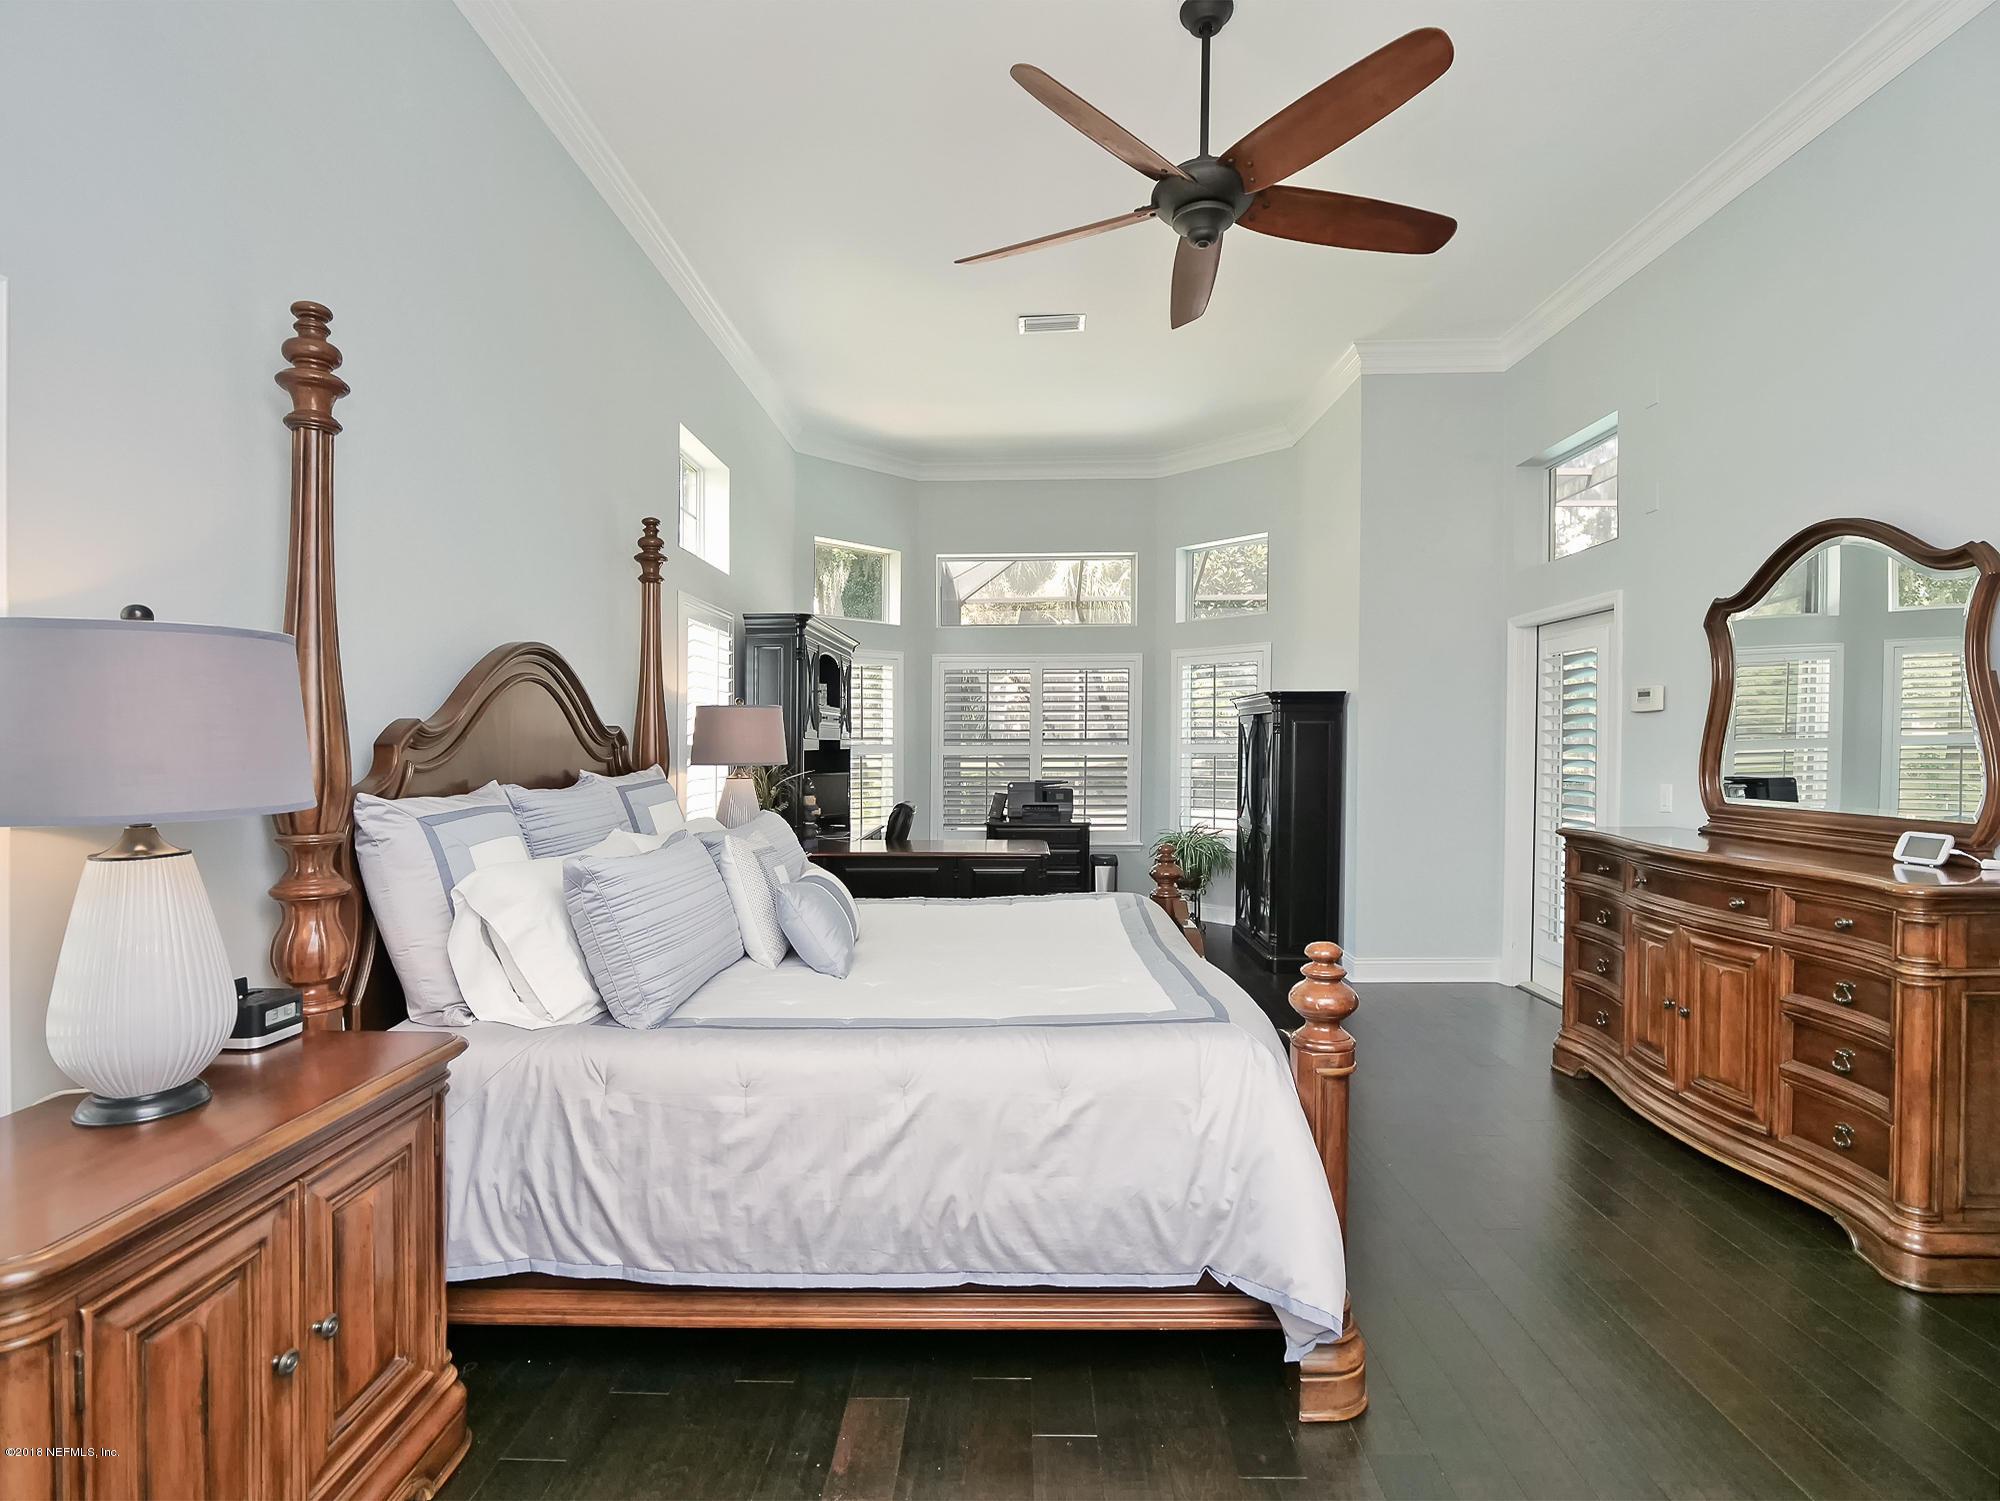 1553 NOTTINGHAM KNOLL, JACKSONVILLE, FLORIDA 32225, 5 Bedrooms Bedrooms, ,4 BathroomsBathrooms,Residential - single family,For sale,NOTTINGHAM KNOLL,949080